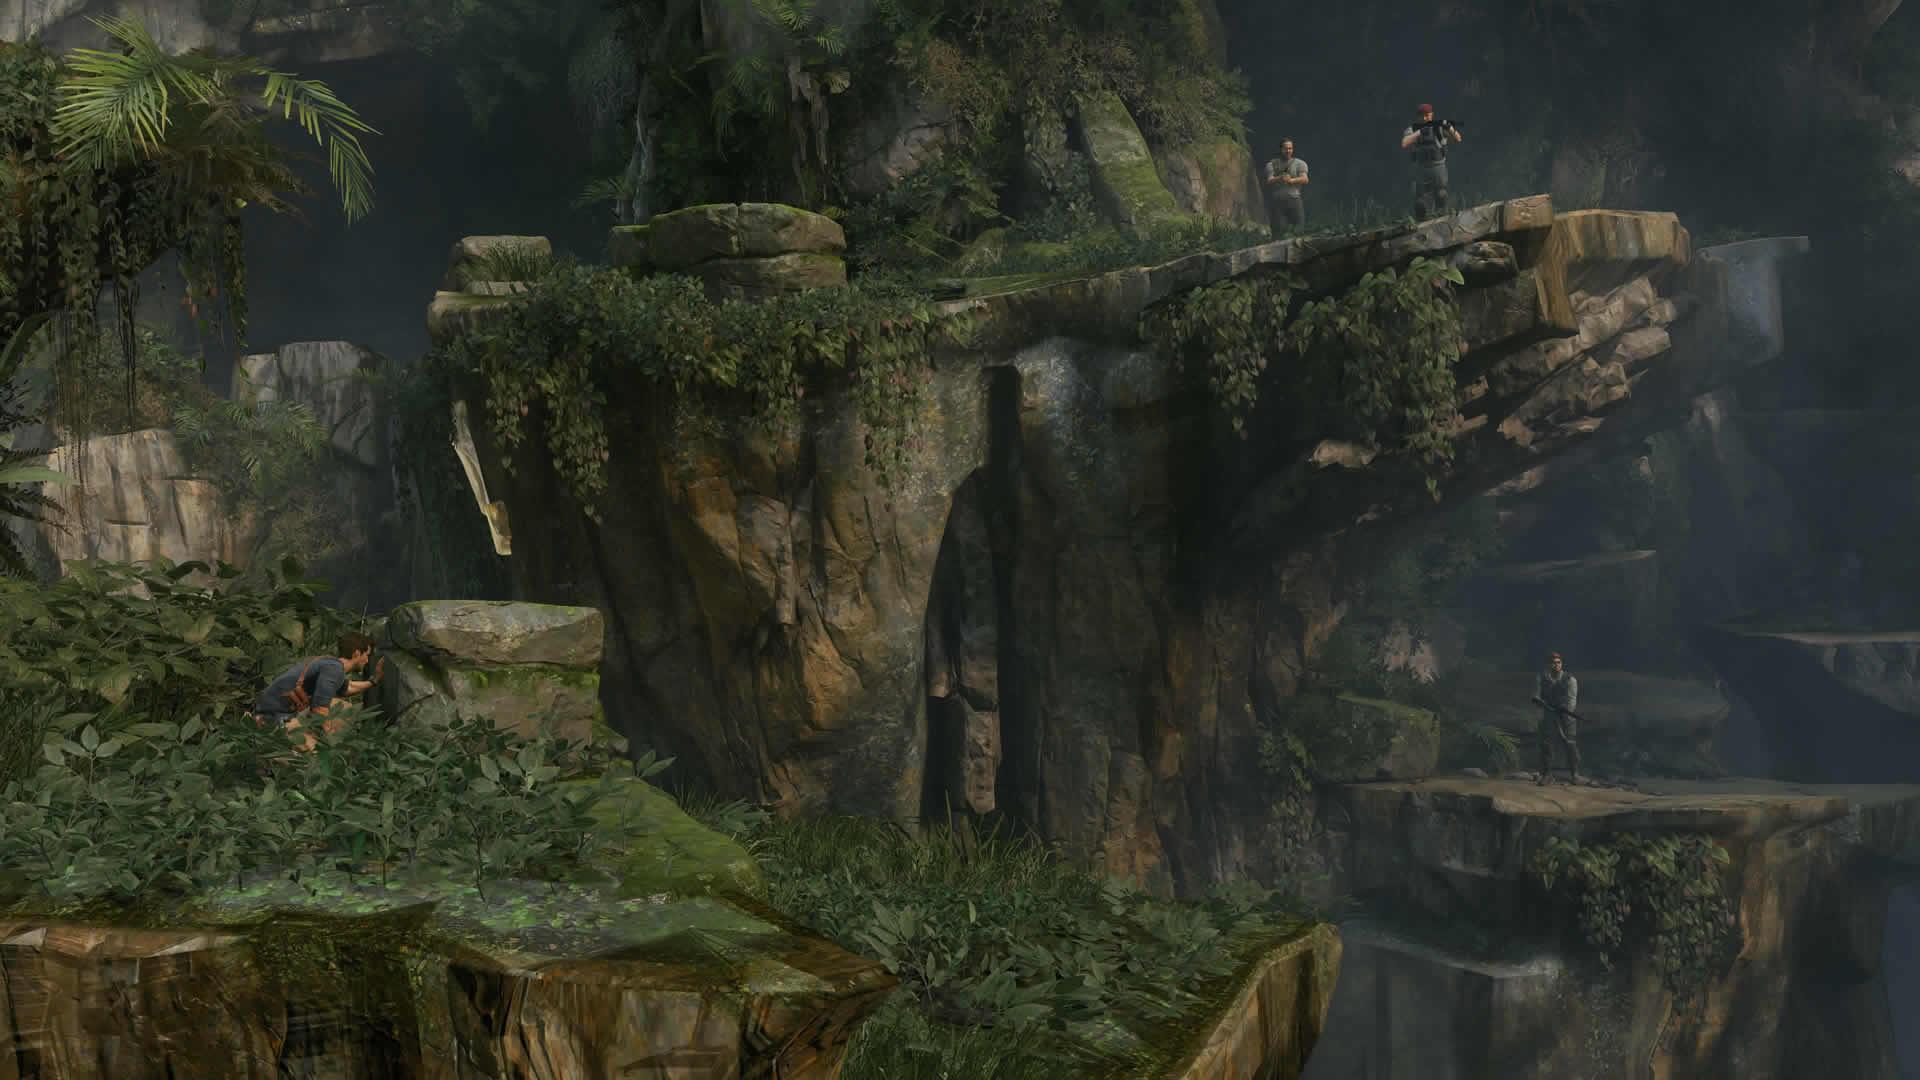 Uncharted 4 Promises Intense Battles